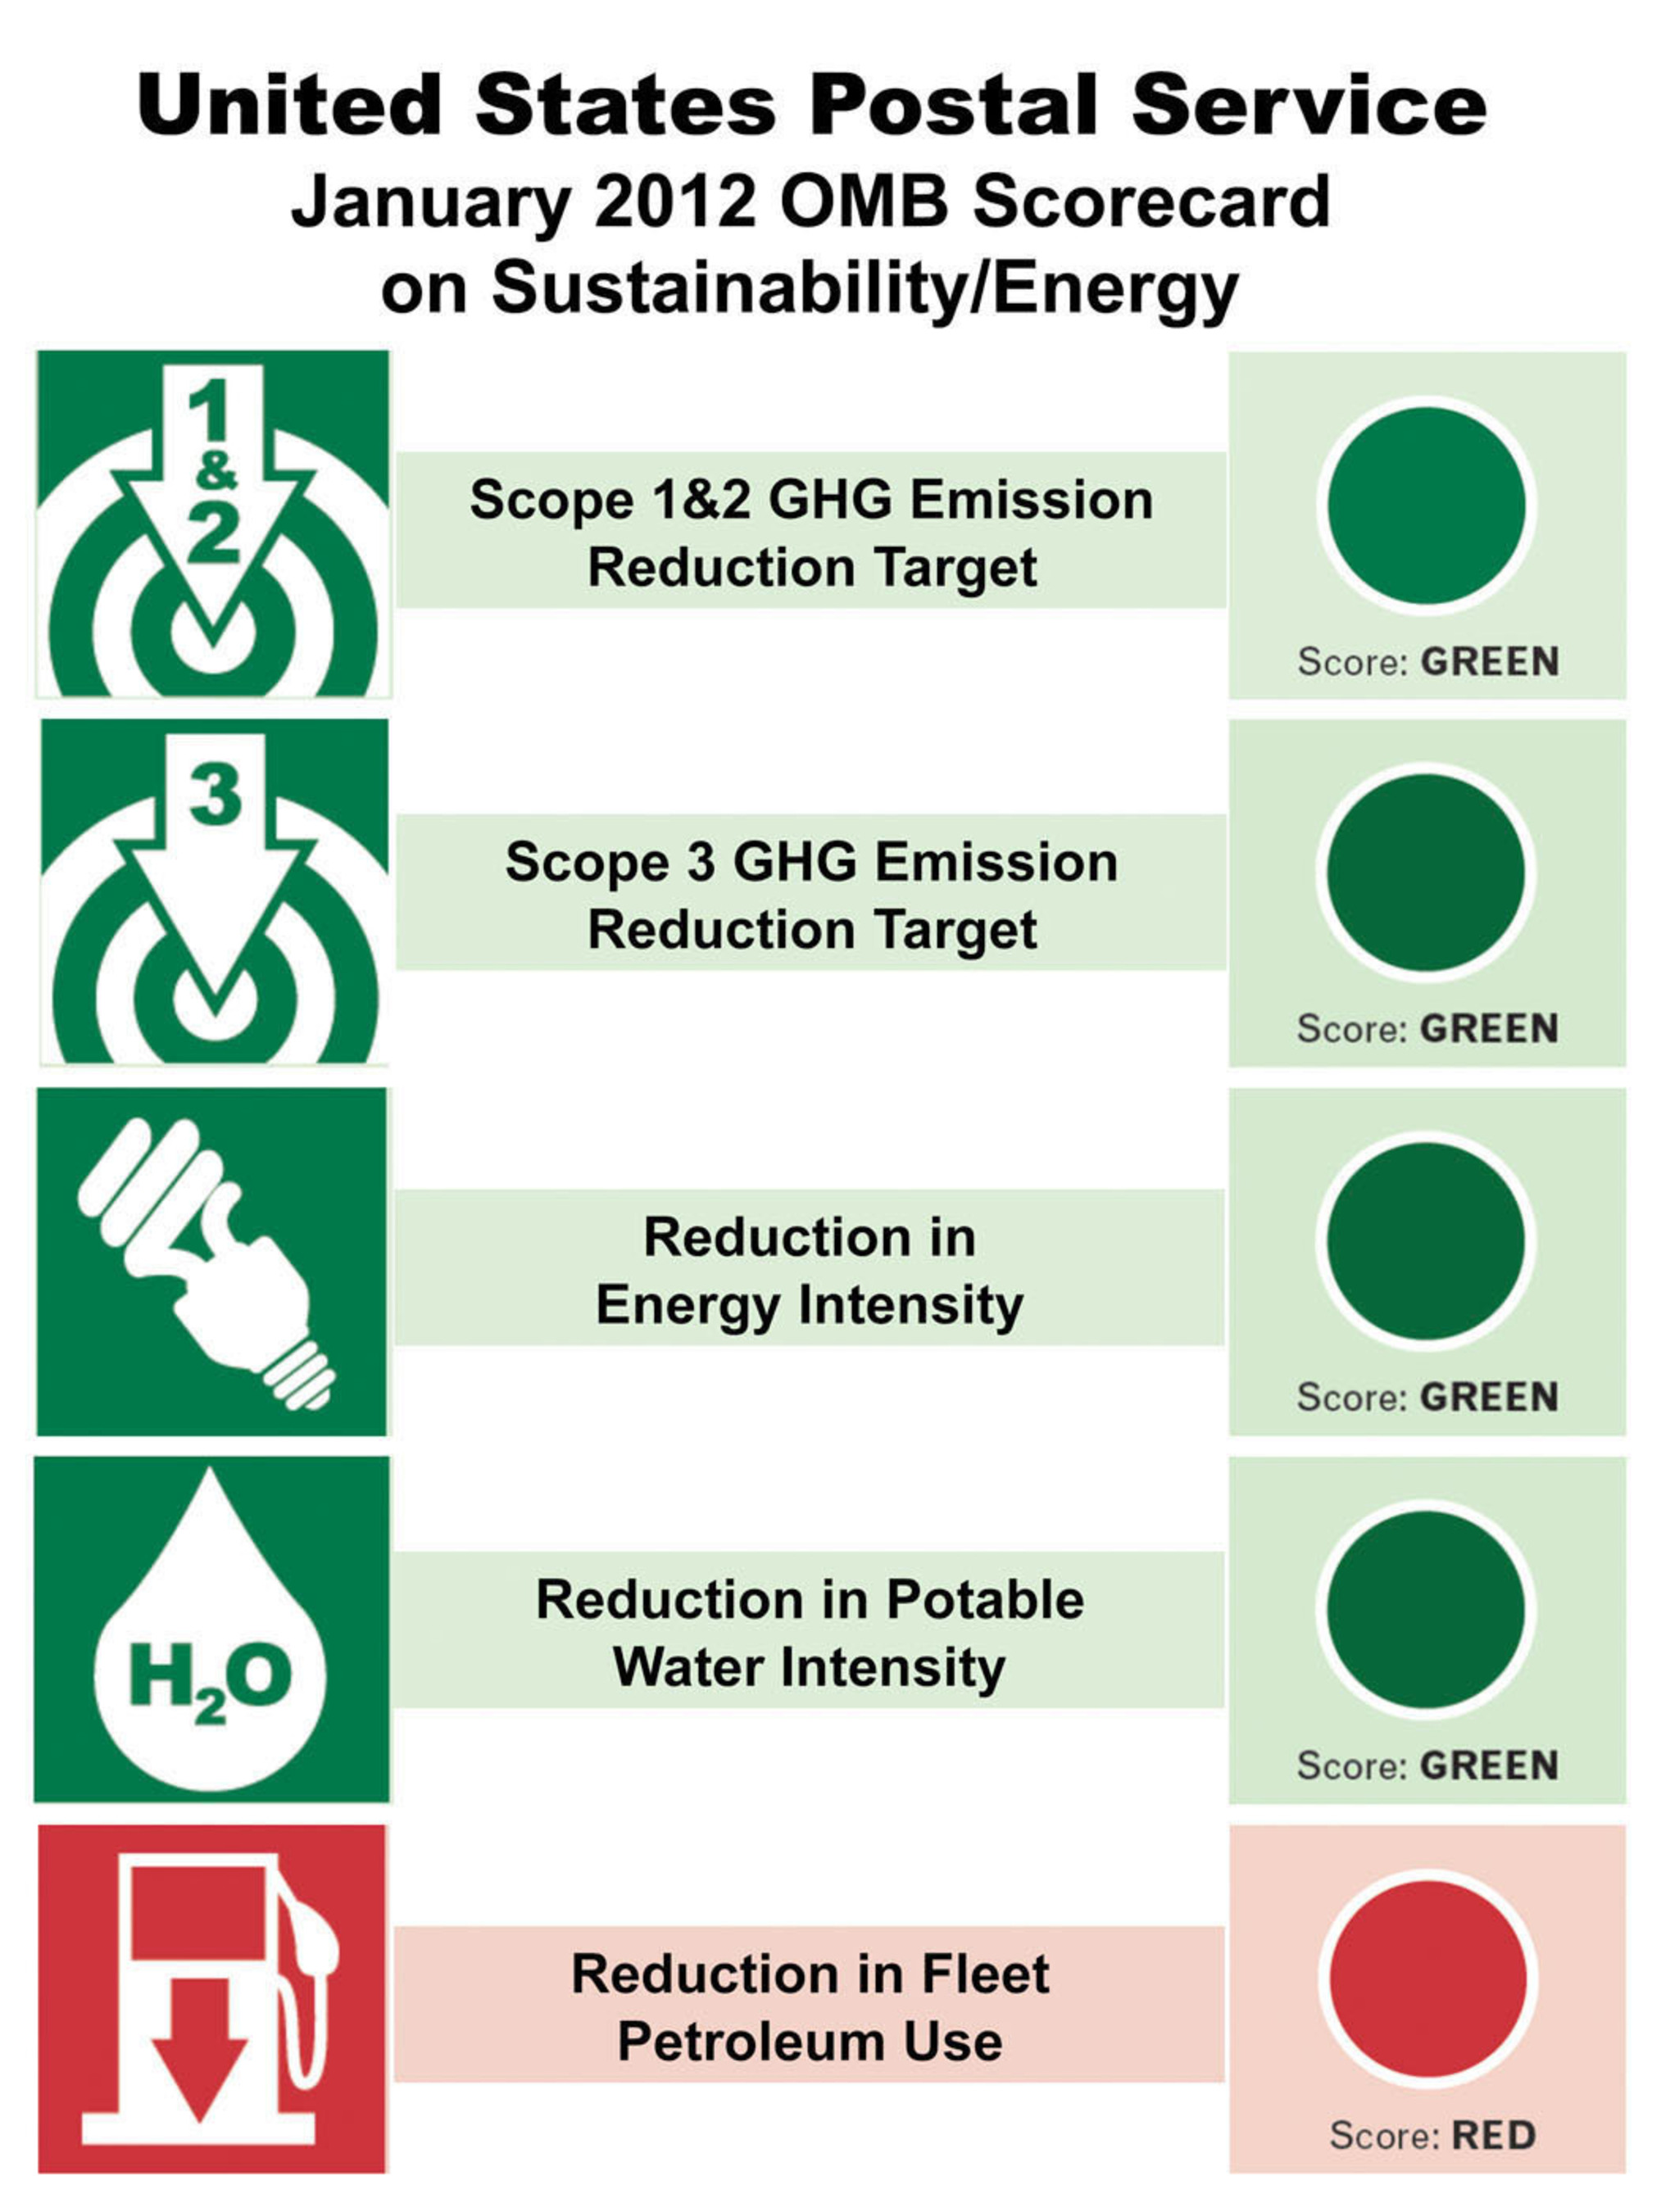 U.S. Postal Service Releases Sustainability and Energy Scorecard